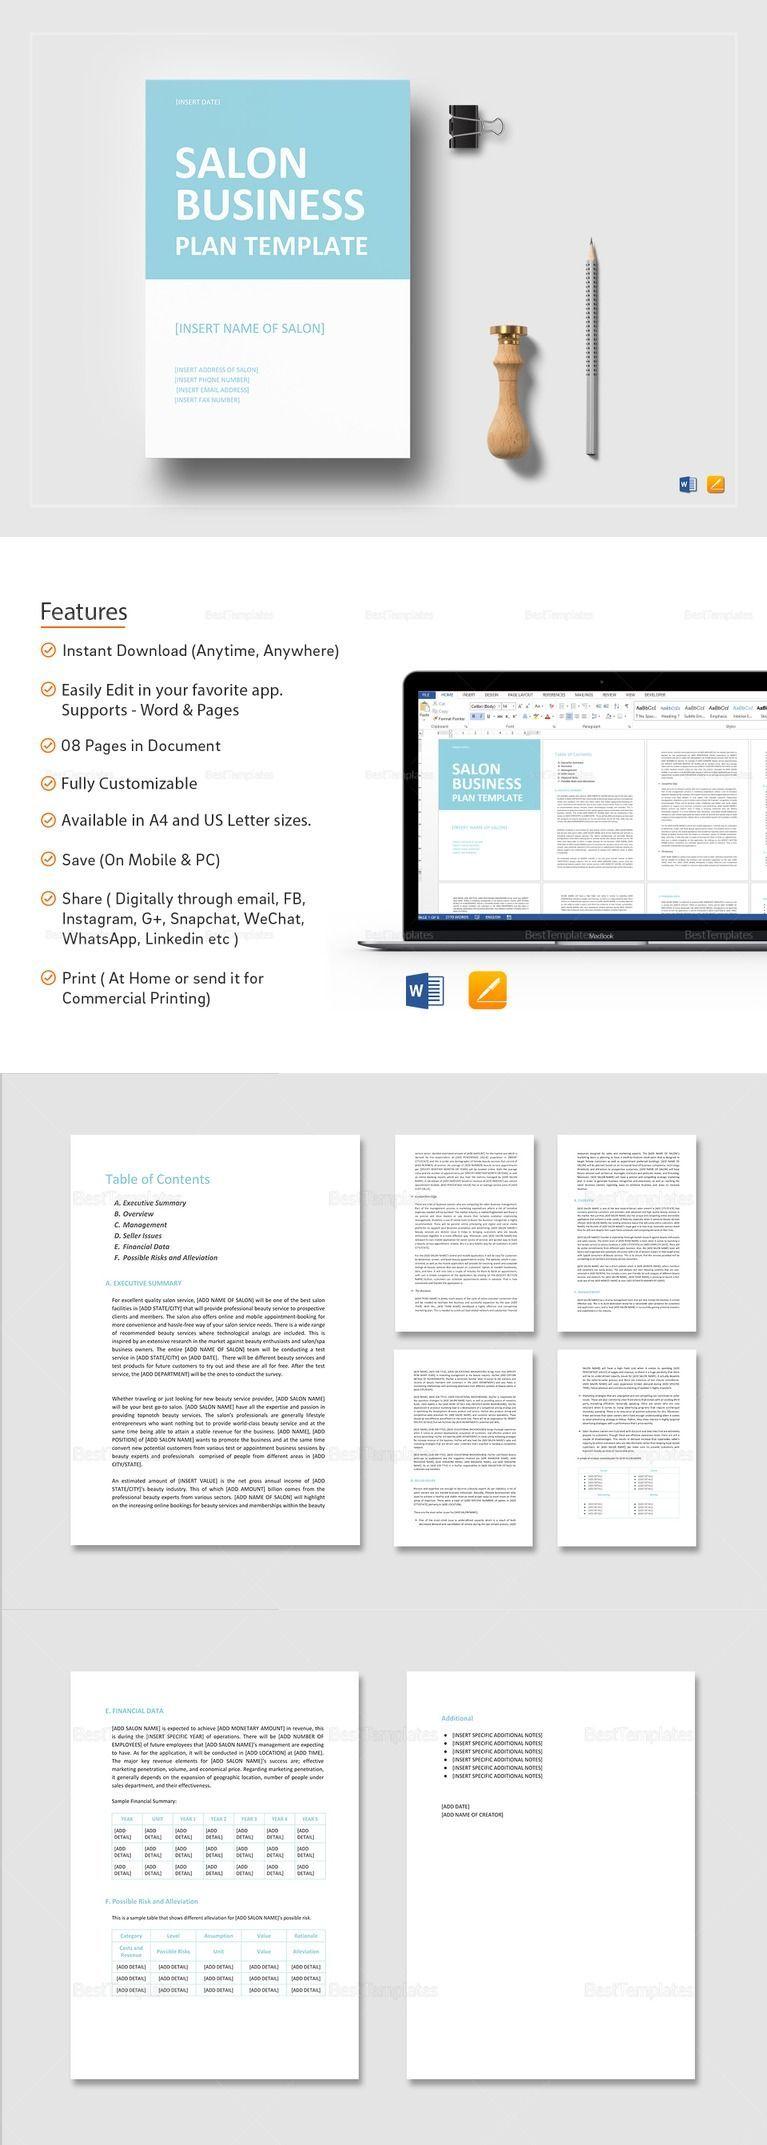 Pin on Business Plan Templates Printable & Professional